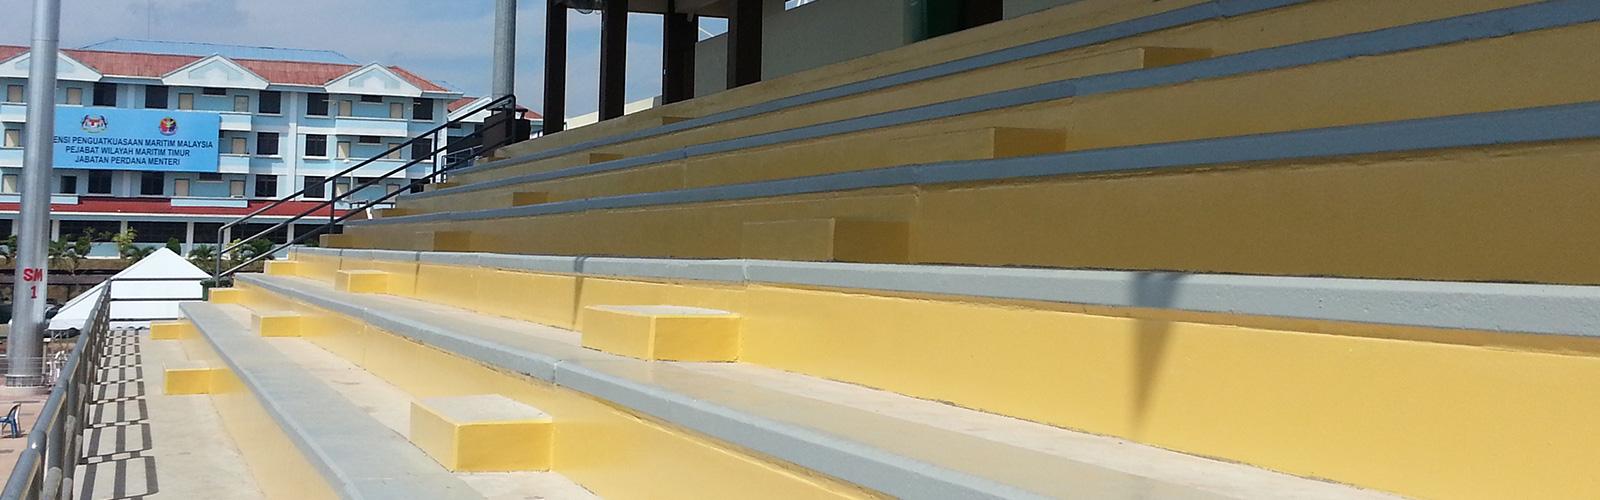 stadium-banner3